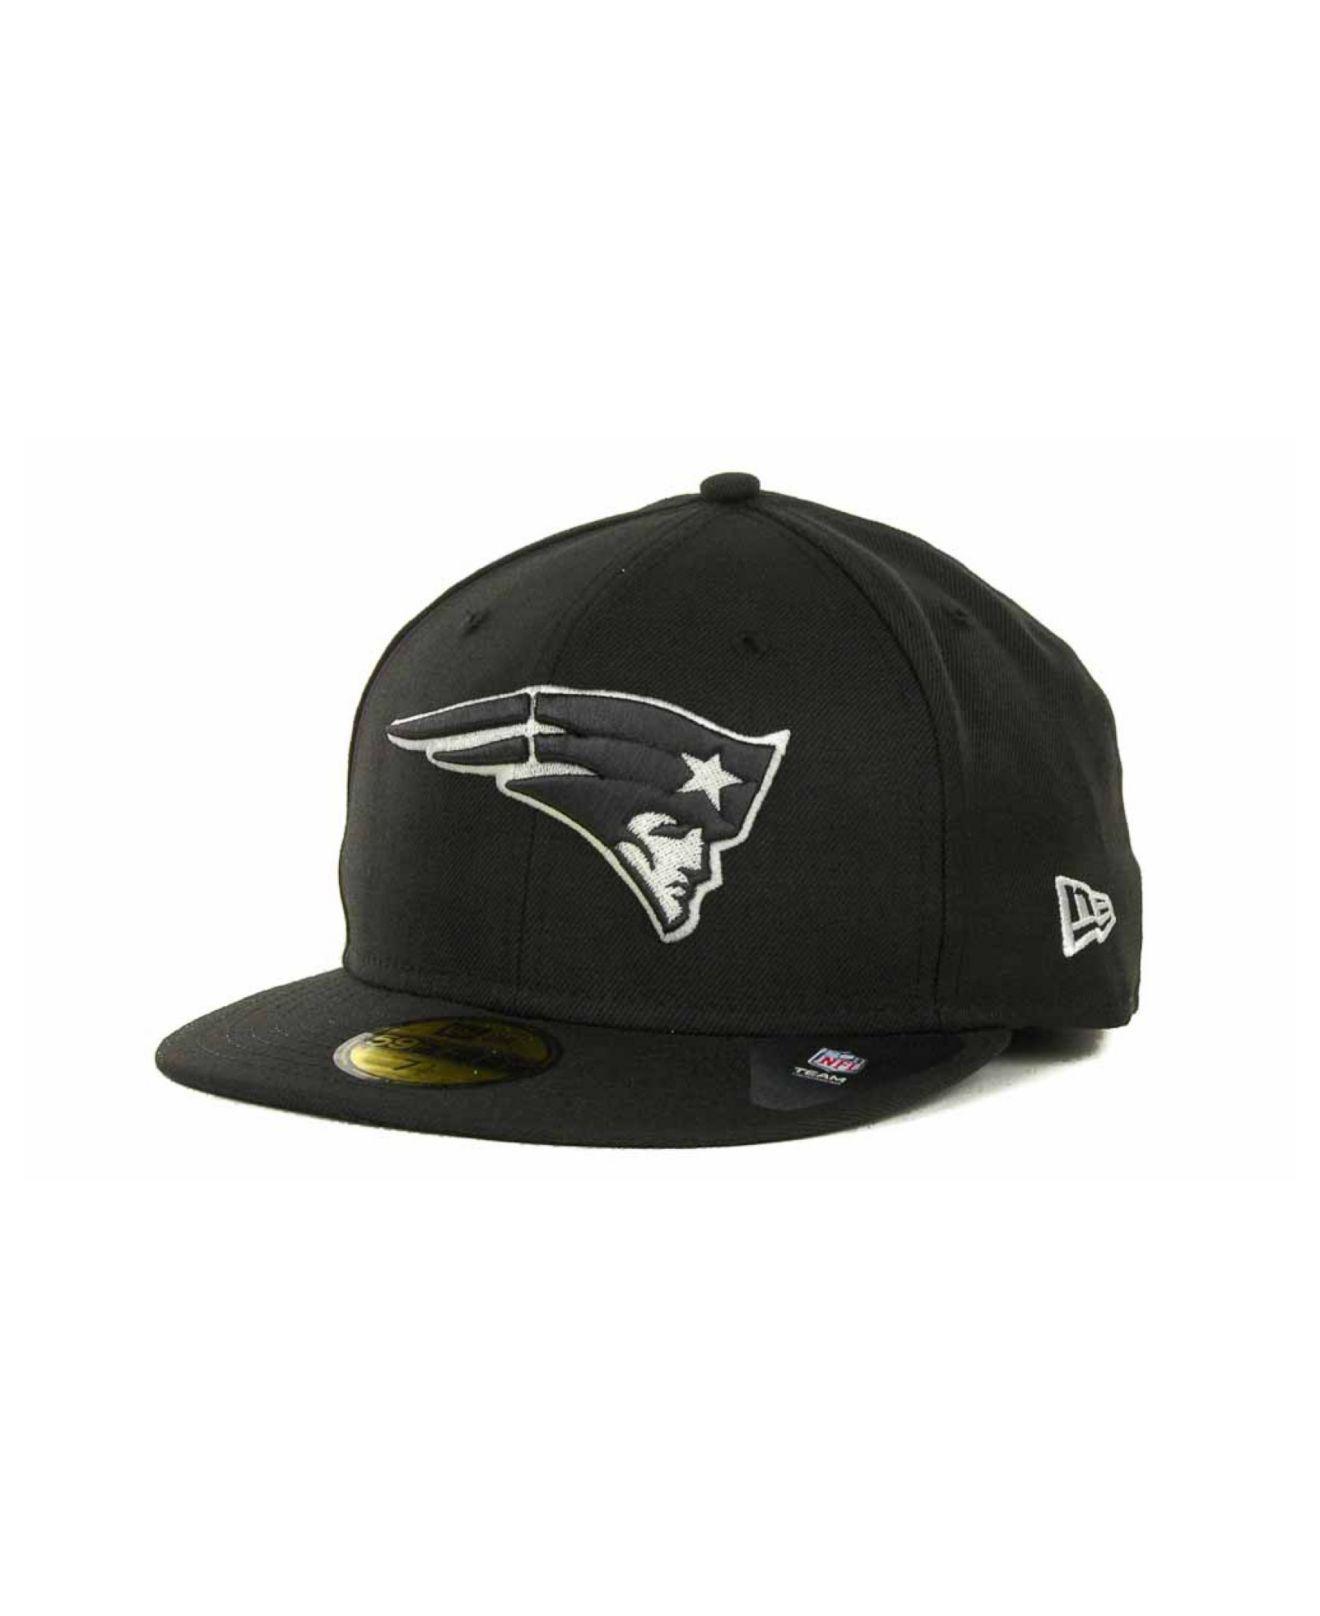 Lyst - Ktz New England Patriots 59fifty Cap in Black for Men 0441e9150